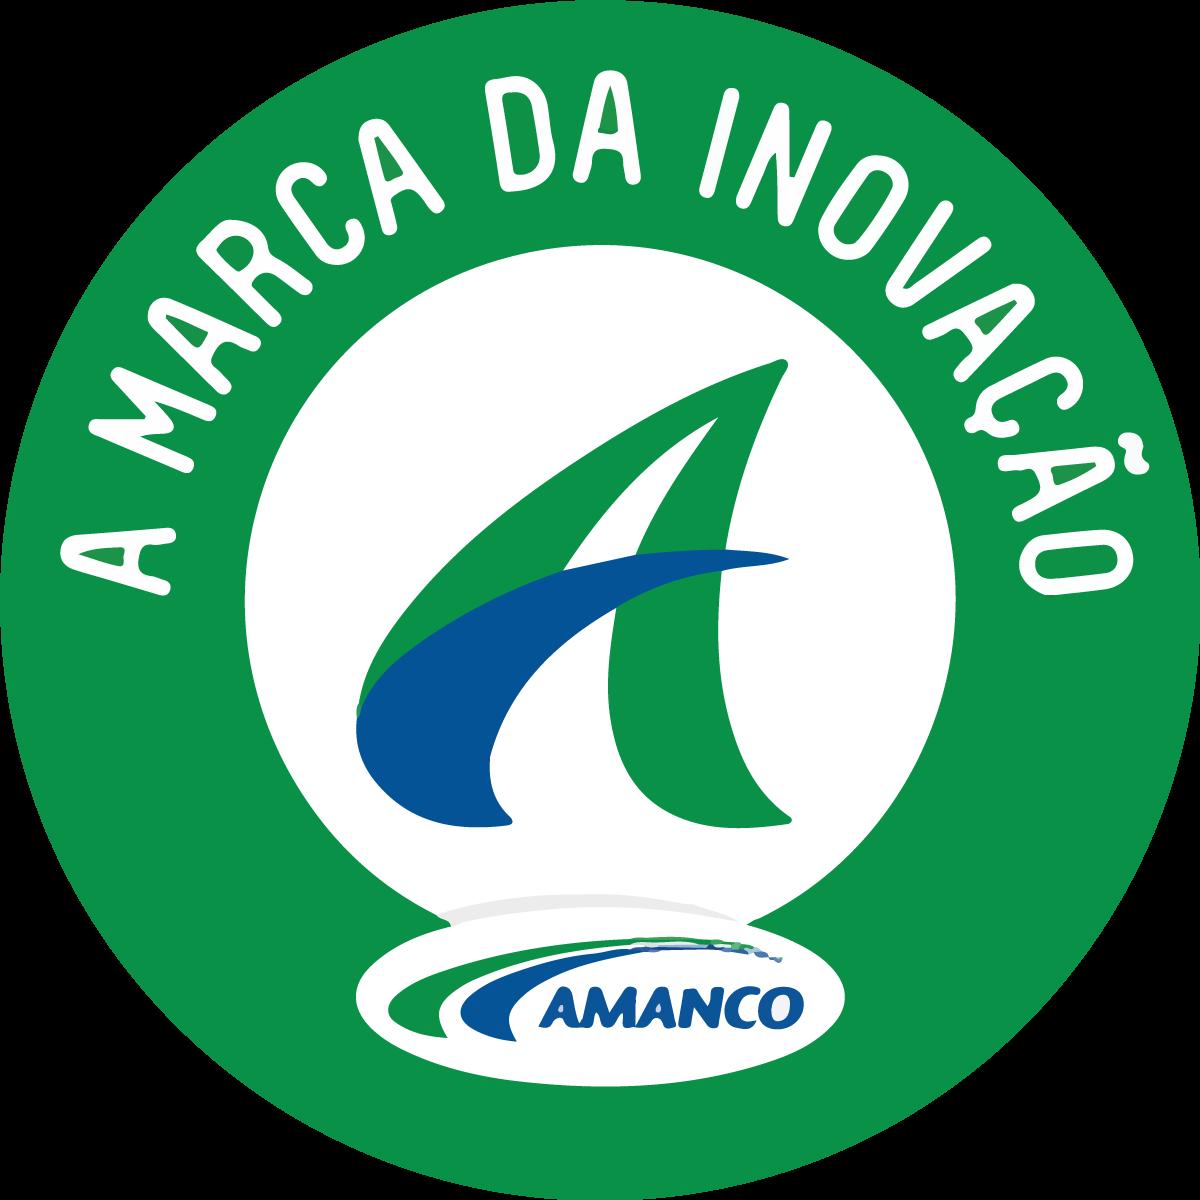 Kit 6 Conectores Engate Rápido P/ Mangueira 1/2'' C/ Stop Amanco